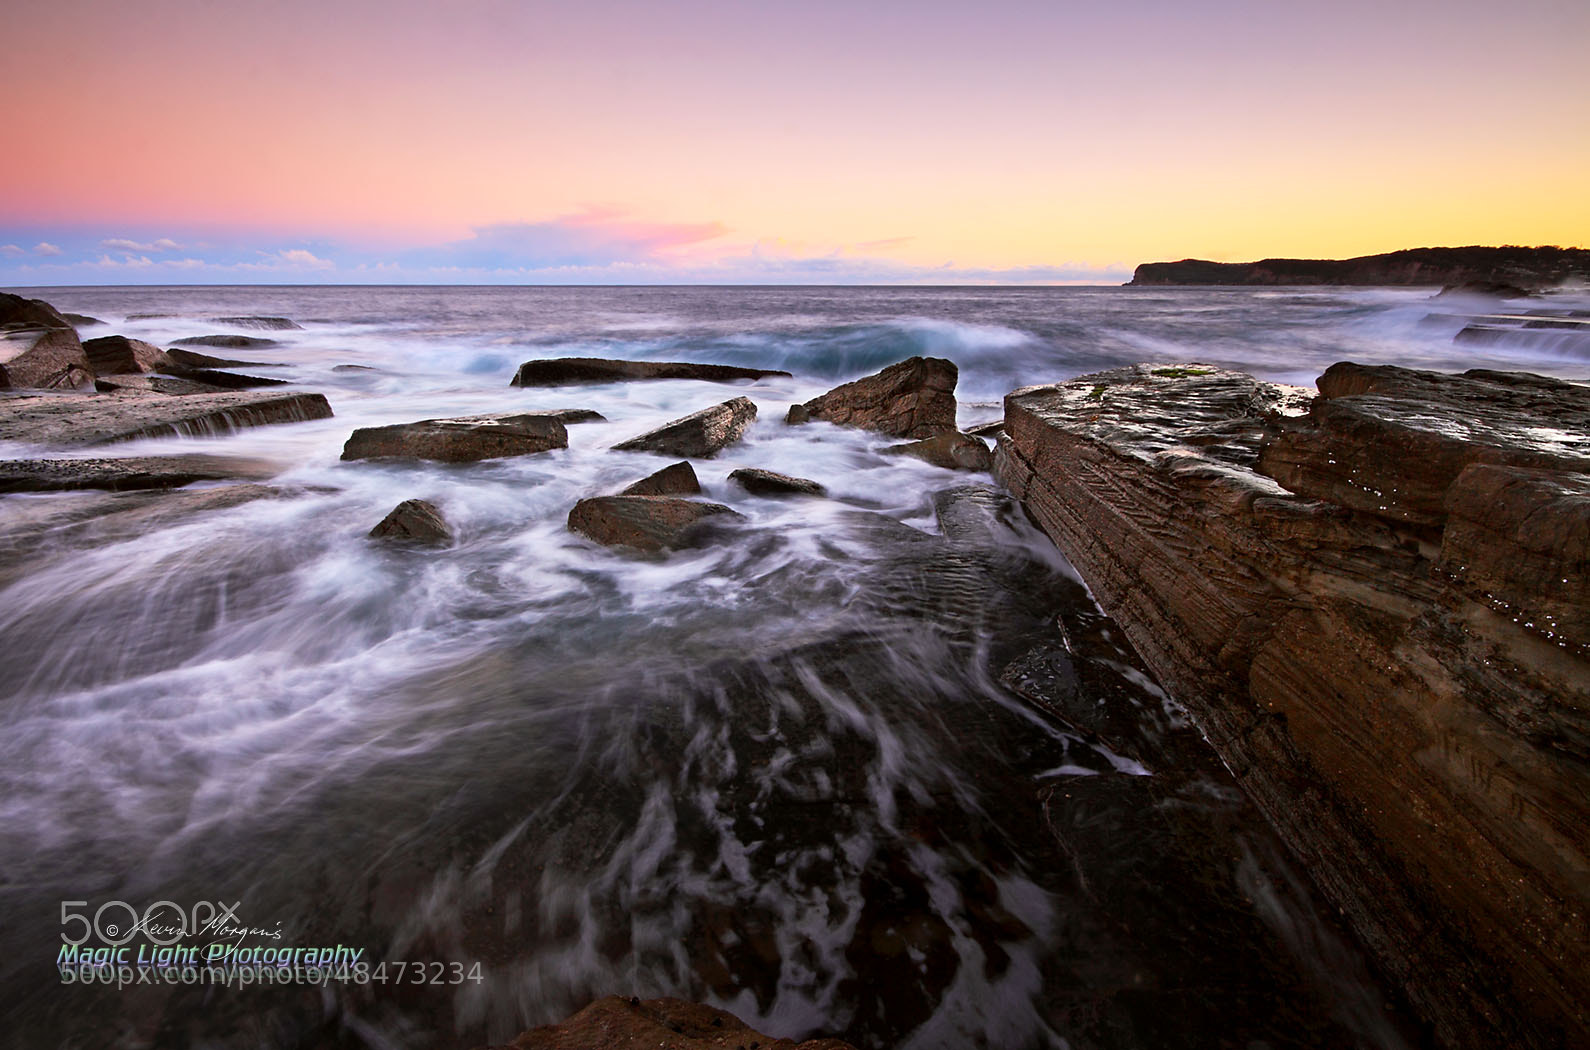 Photograph Skillion Rocks Sunset #3 by Kevin Morgan on 500px